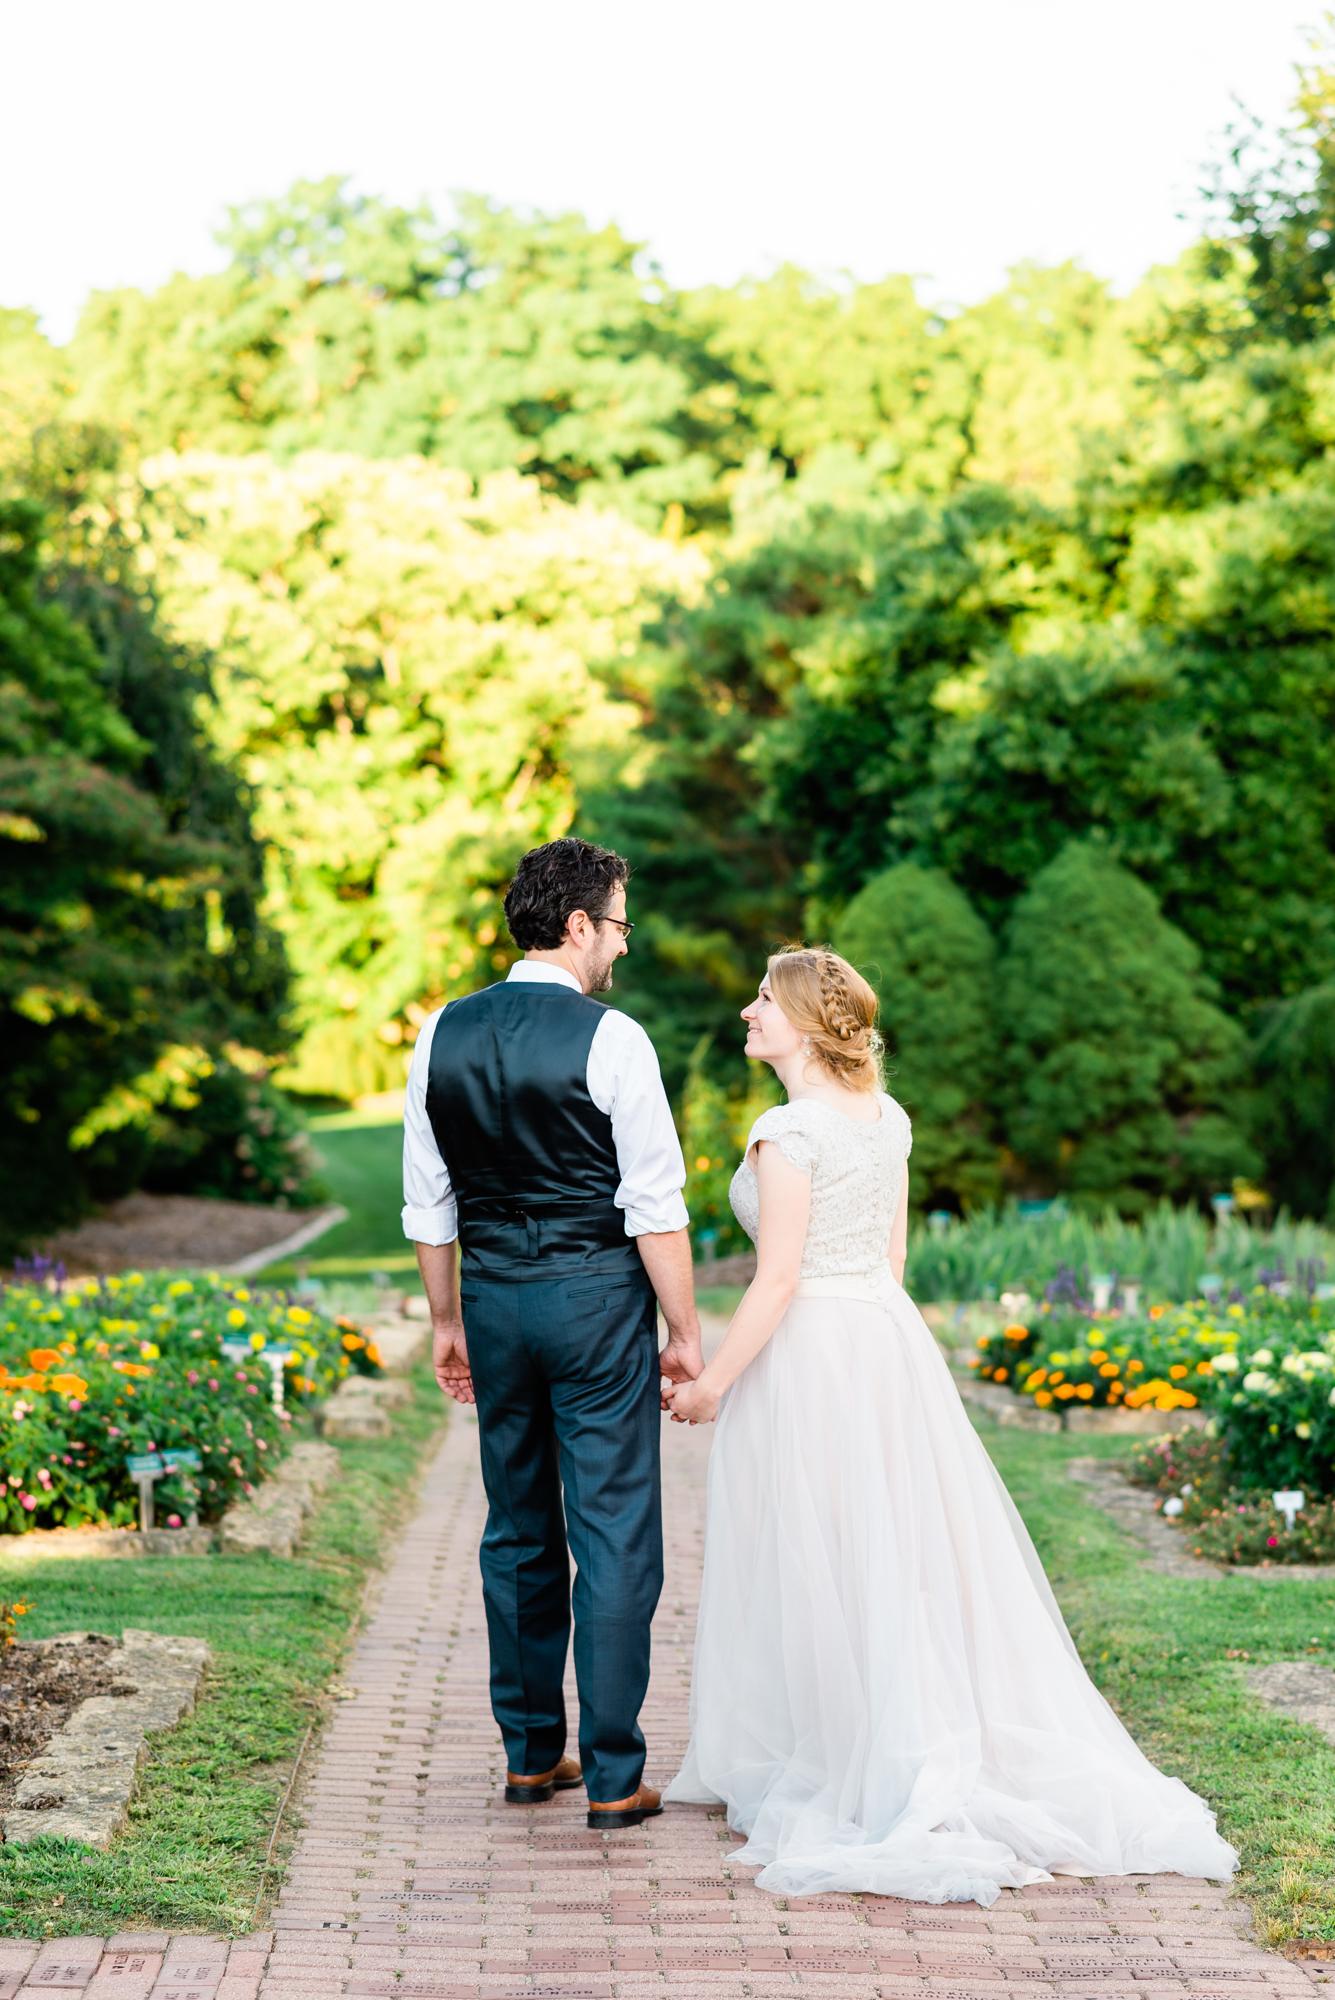 Arboretum and Botanical Gardens - Dubuque, Iowa, Wedding Photographer